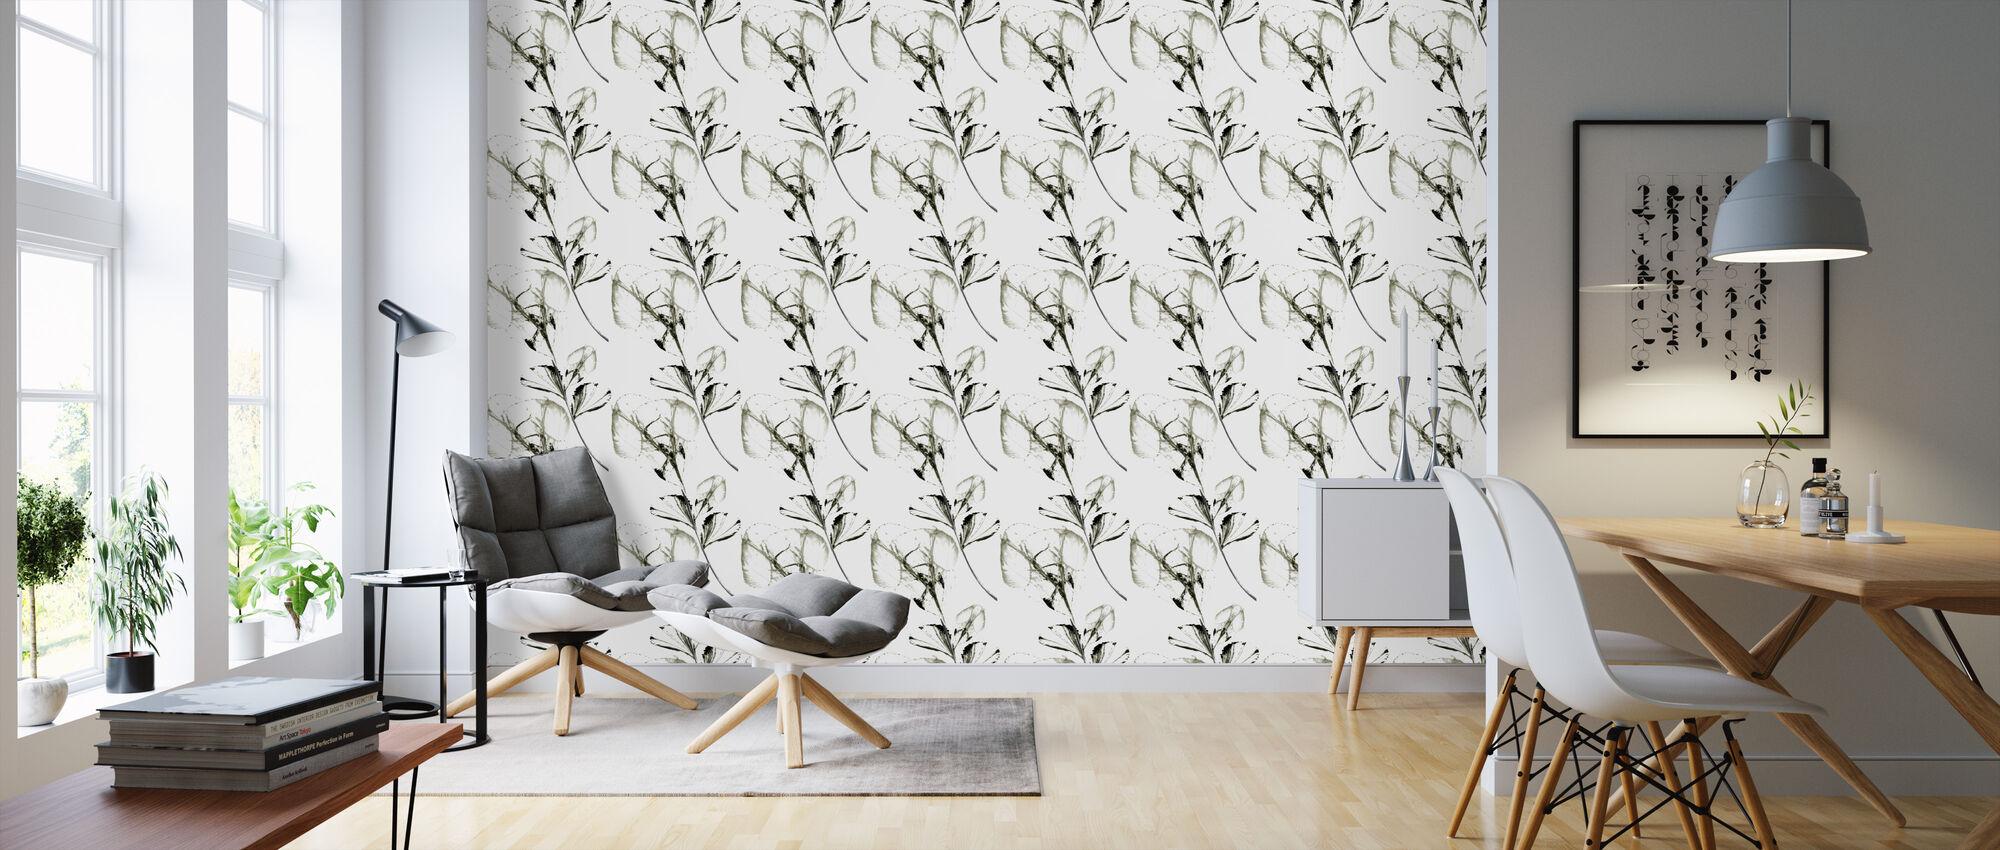 Air - Wallpaper - Living Room